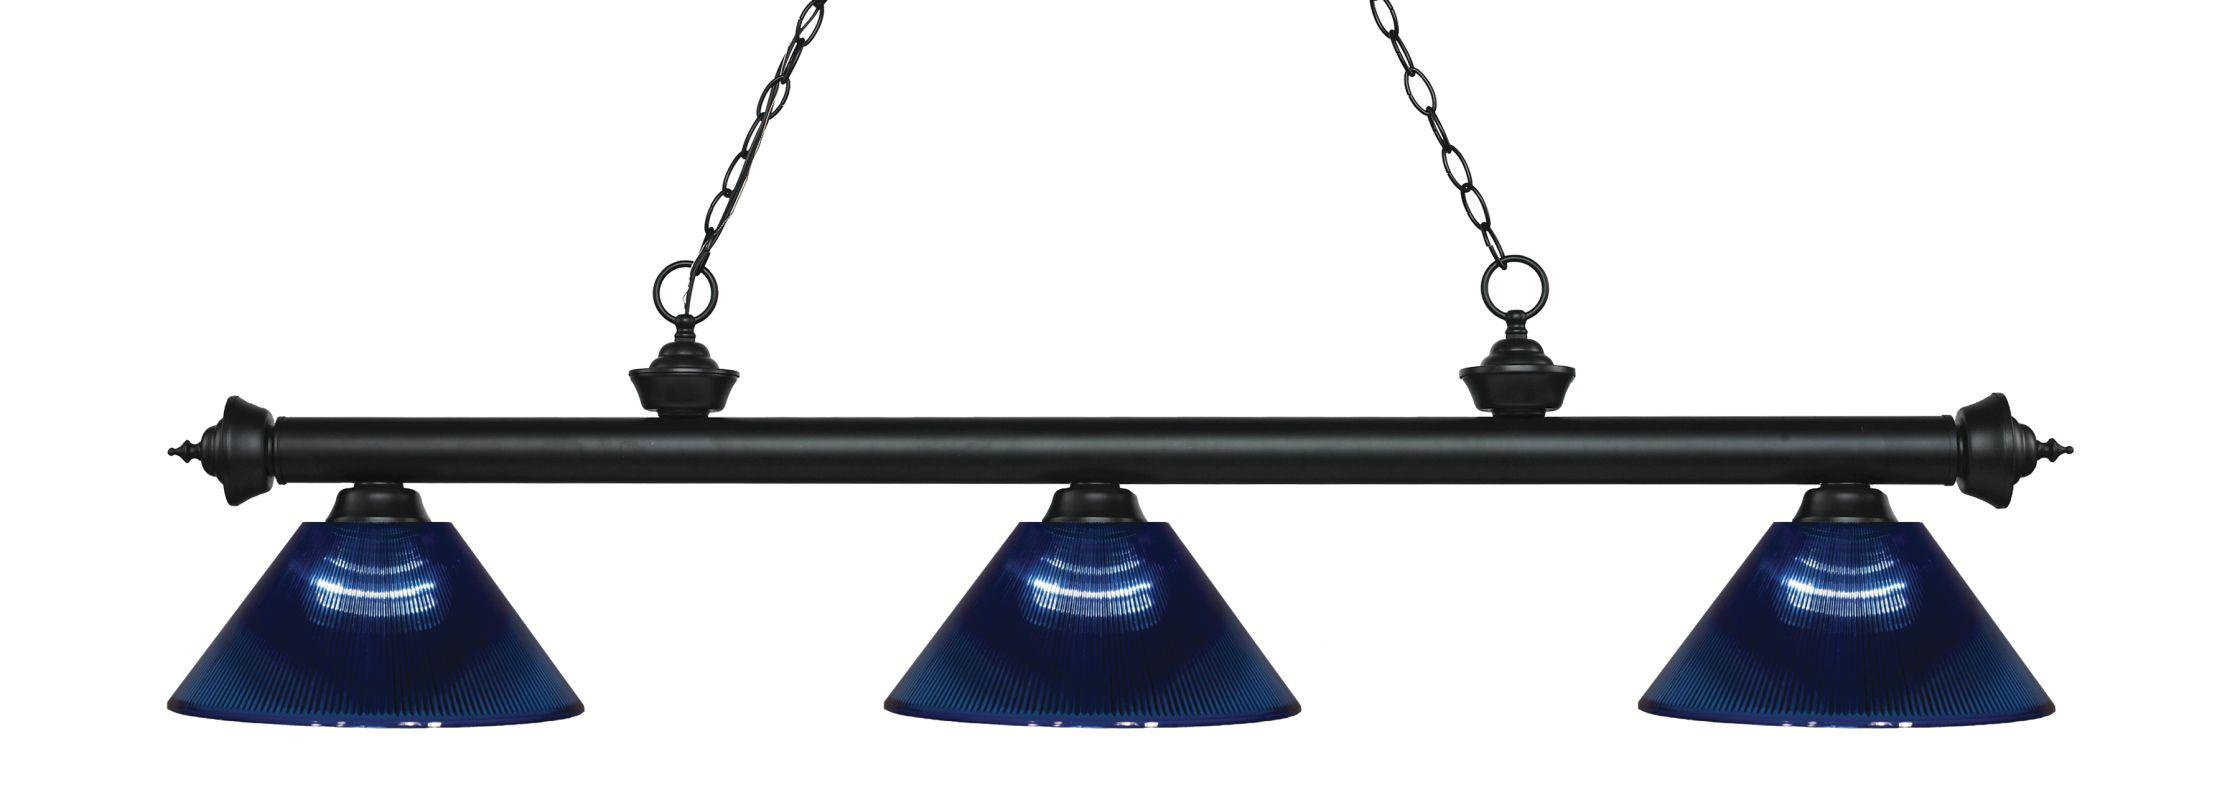 Z-Lite 200-3-ARDB Riviera 3 Light Island/Billiard Chandelier with Dark Sale $244.00 ITEM: bci2734633 ID#:200-3MB-ARDB UPC: 685659054125 :